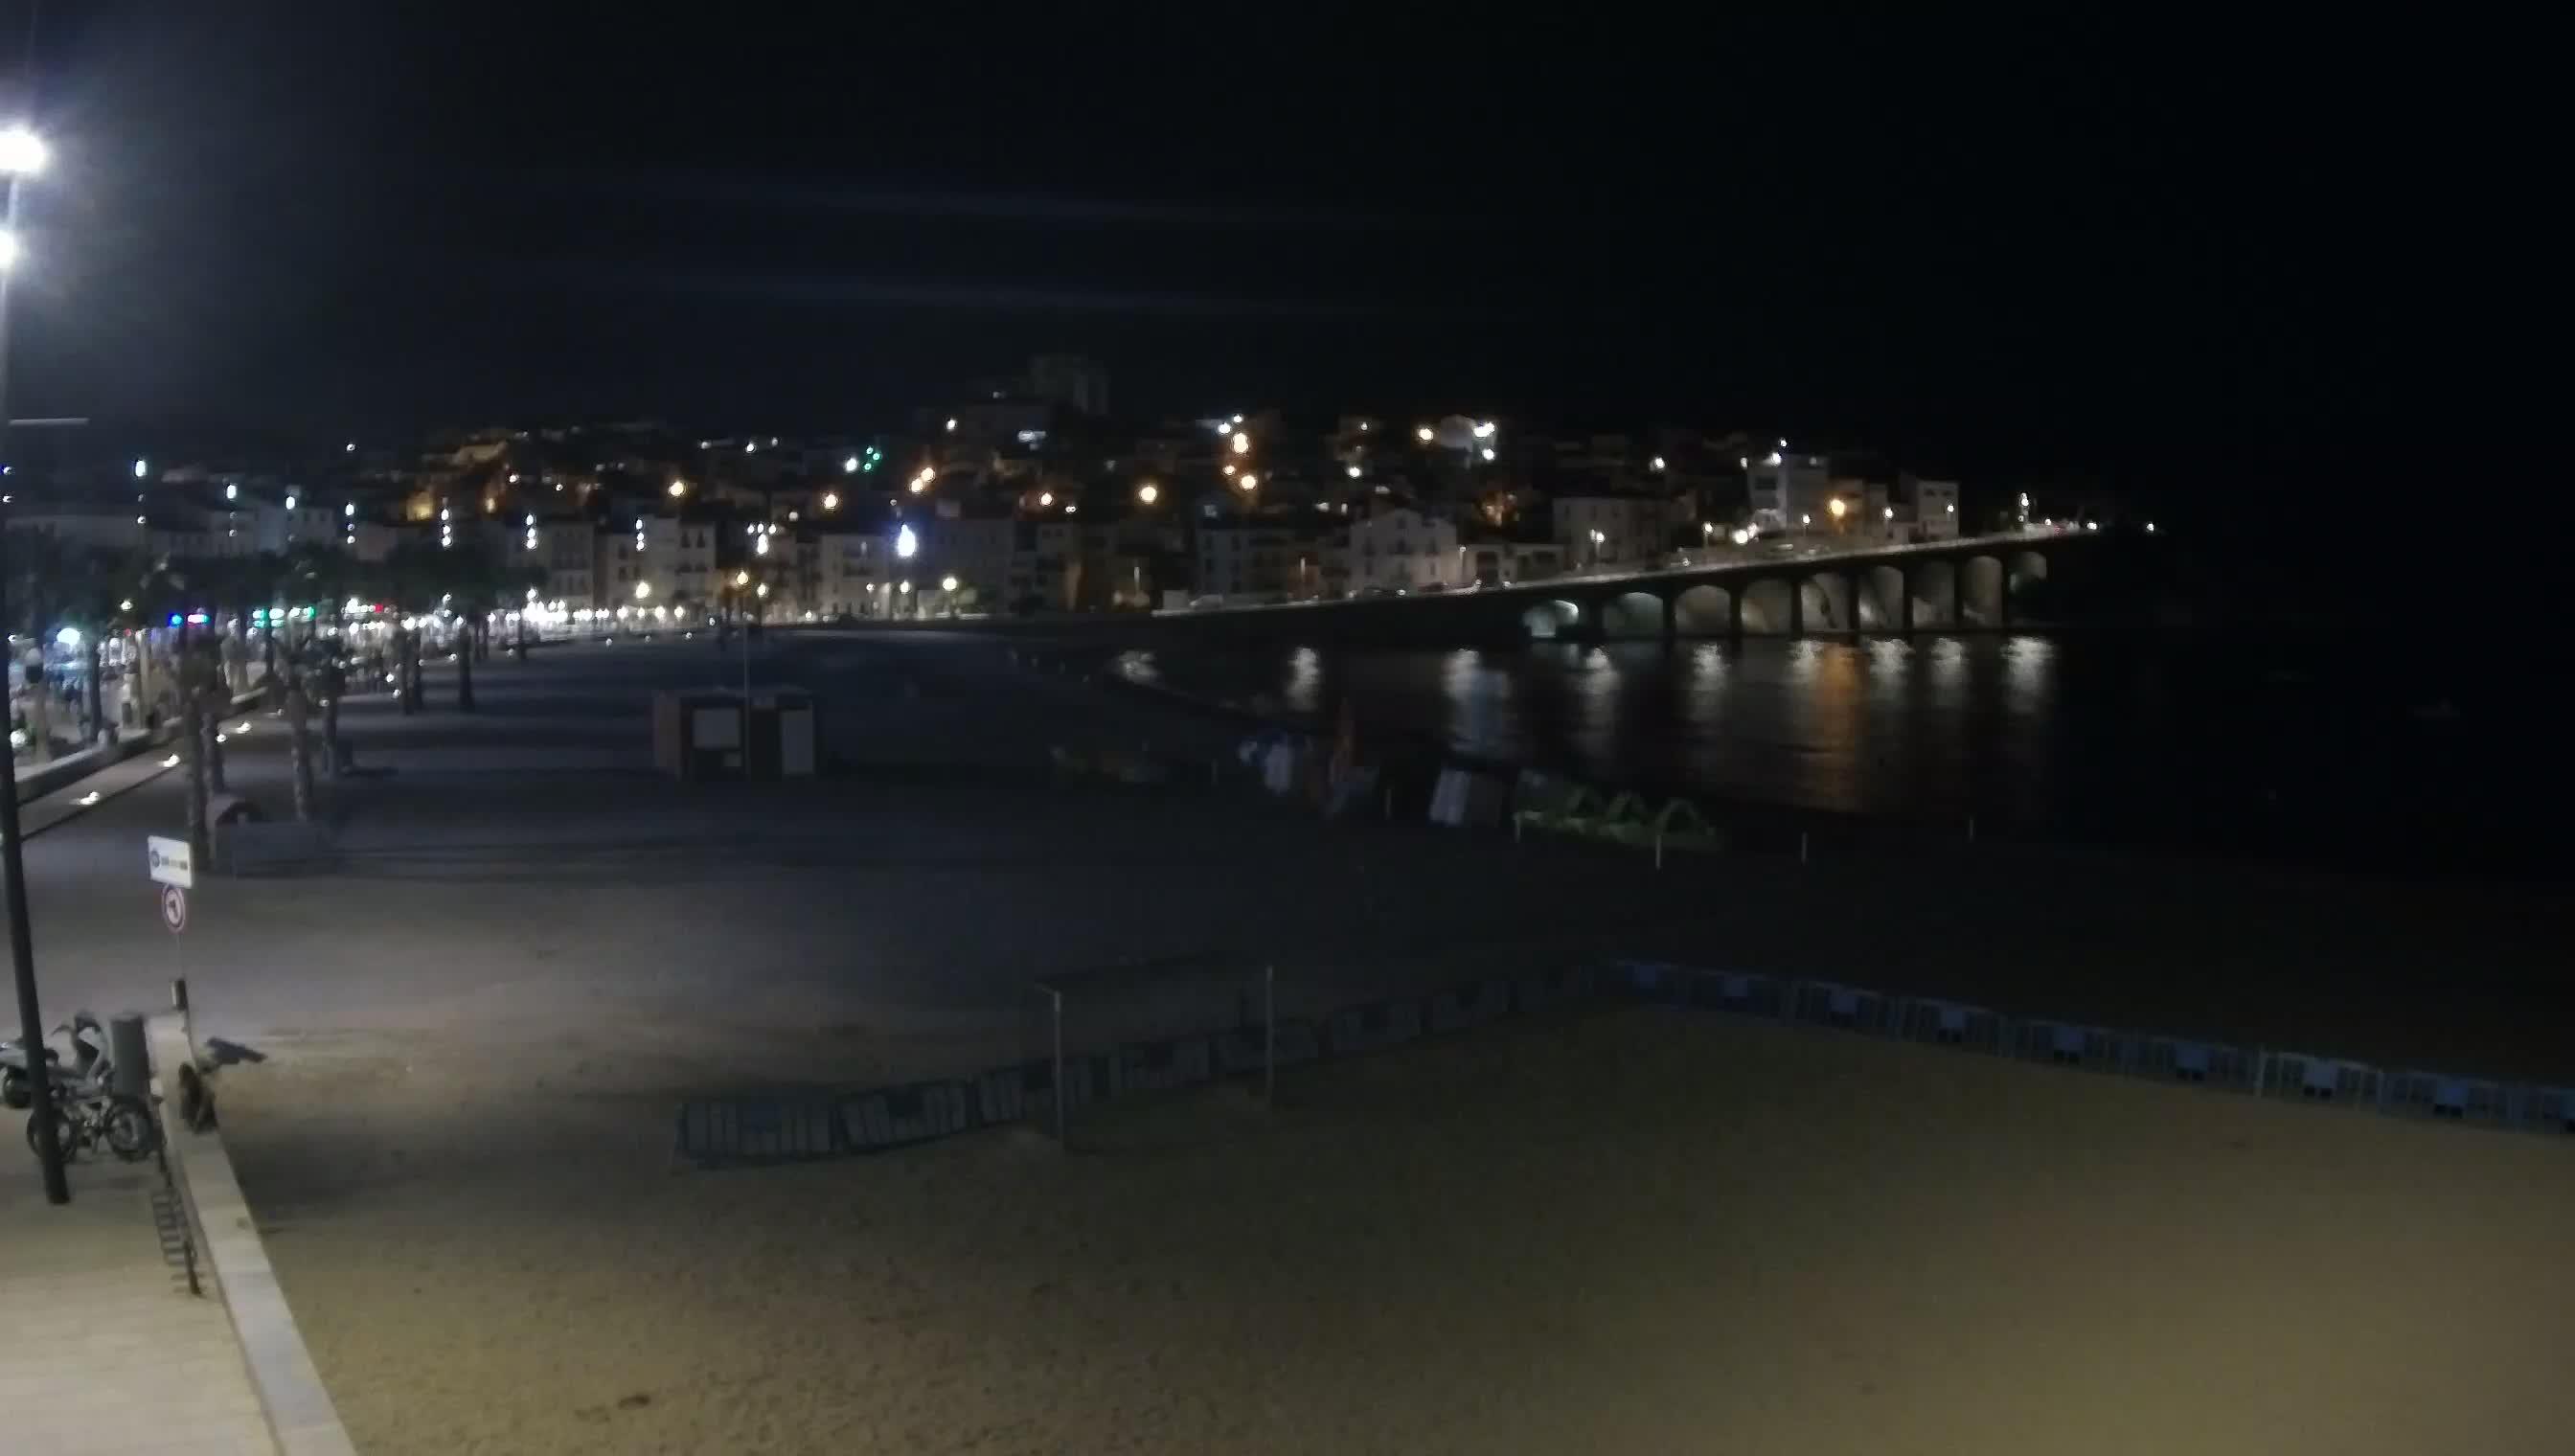 Banyuls-sur-Mer Fri. 23:22